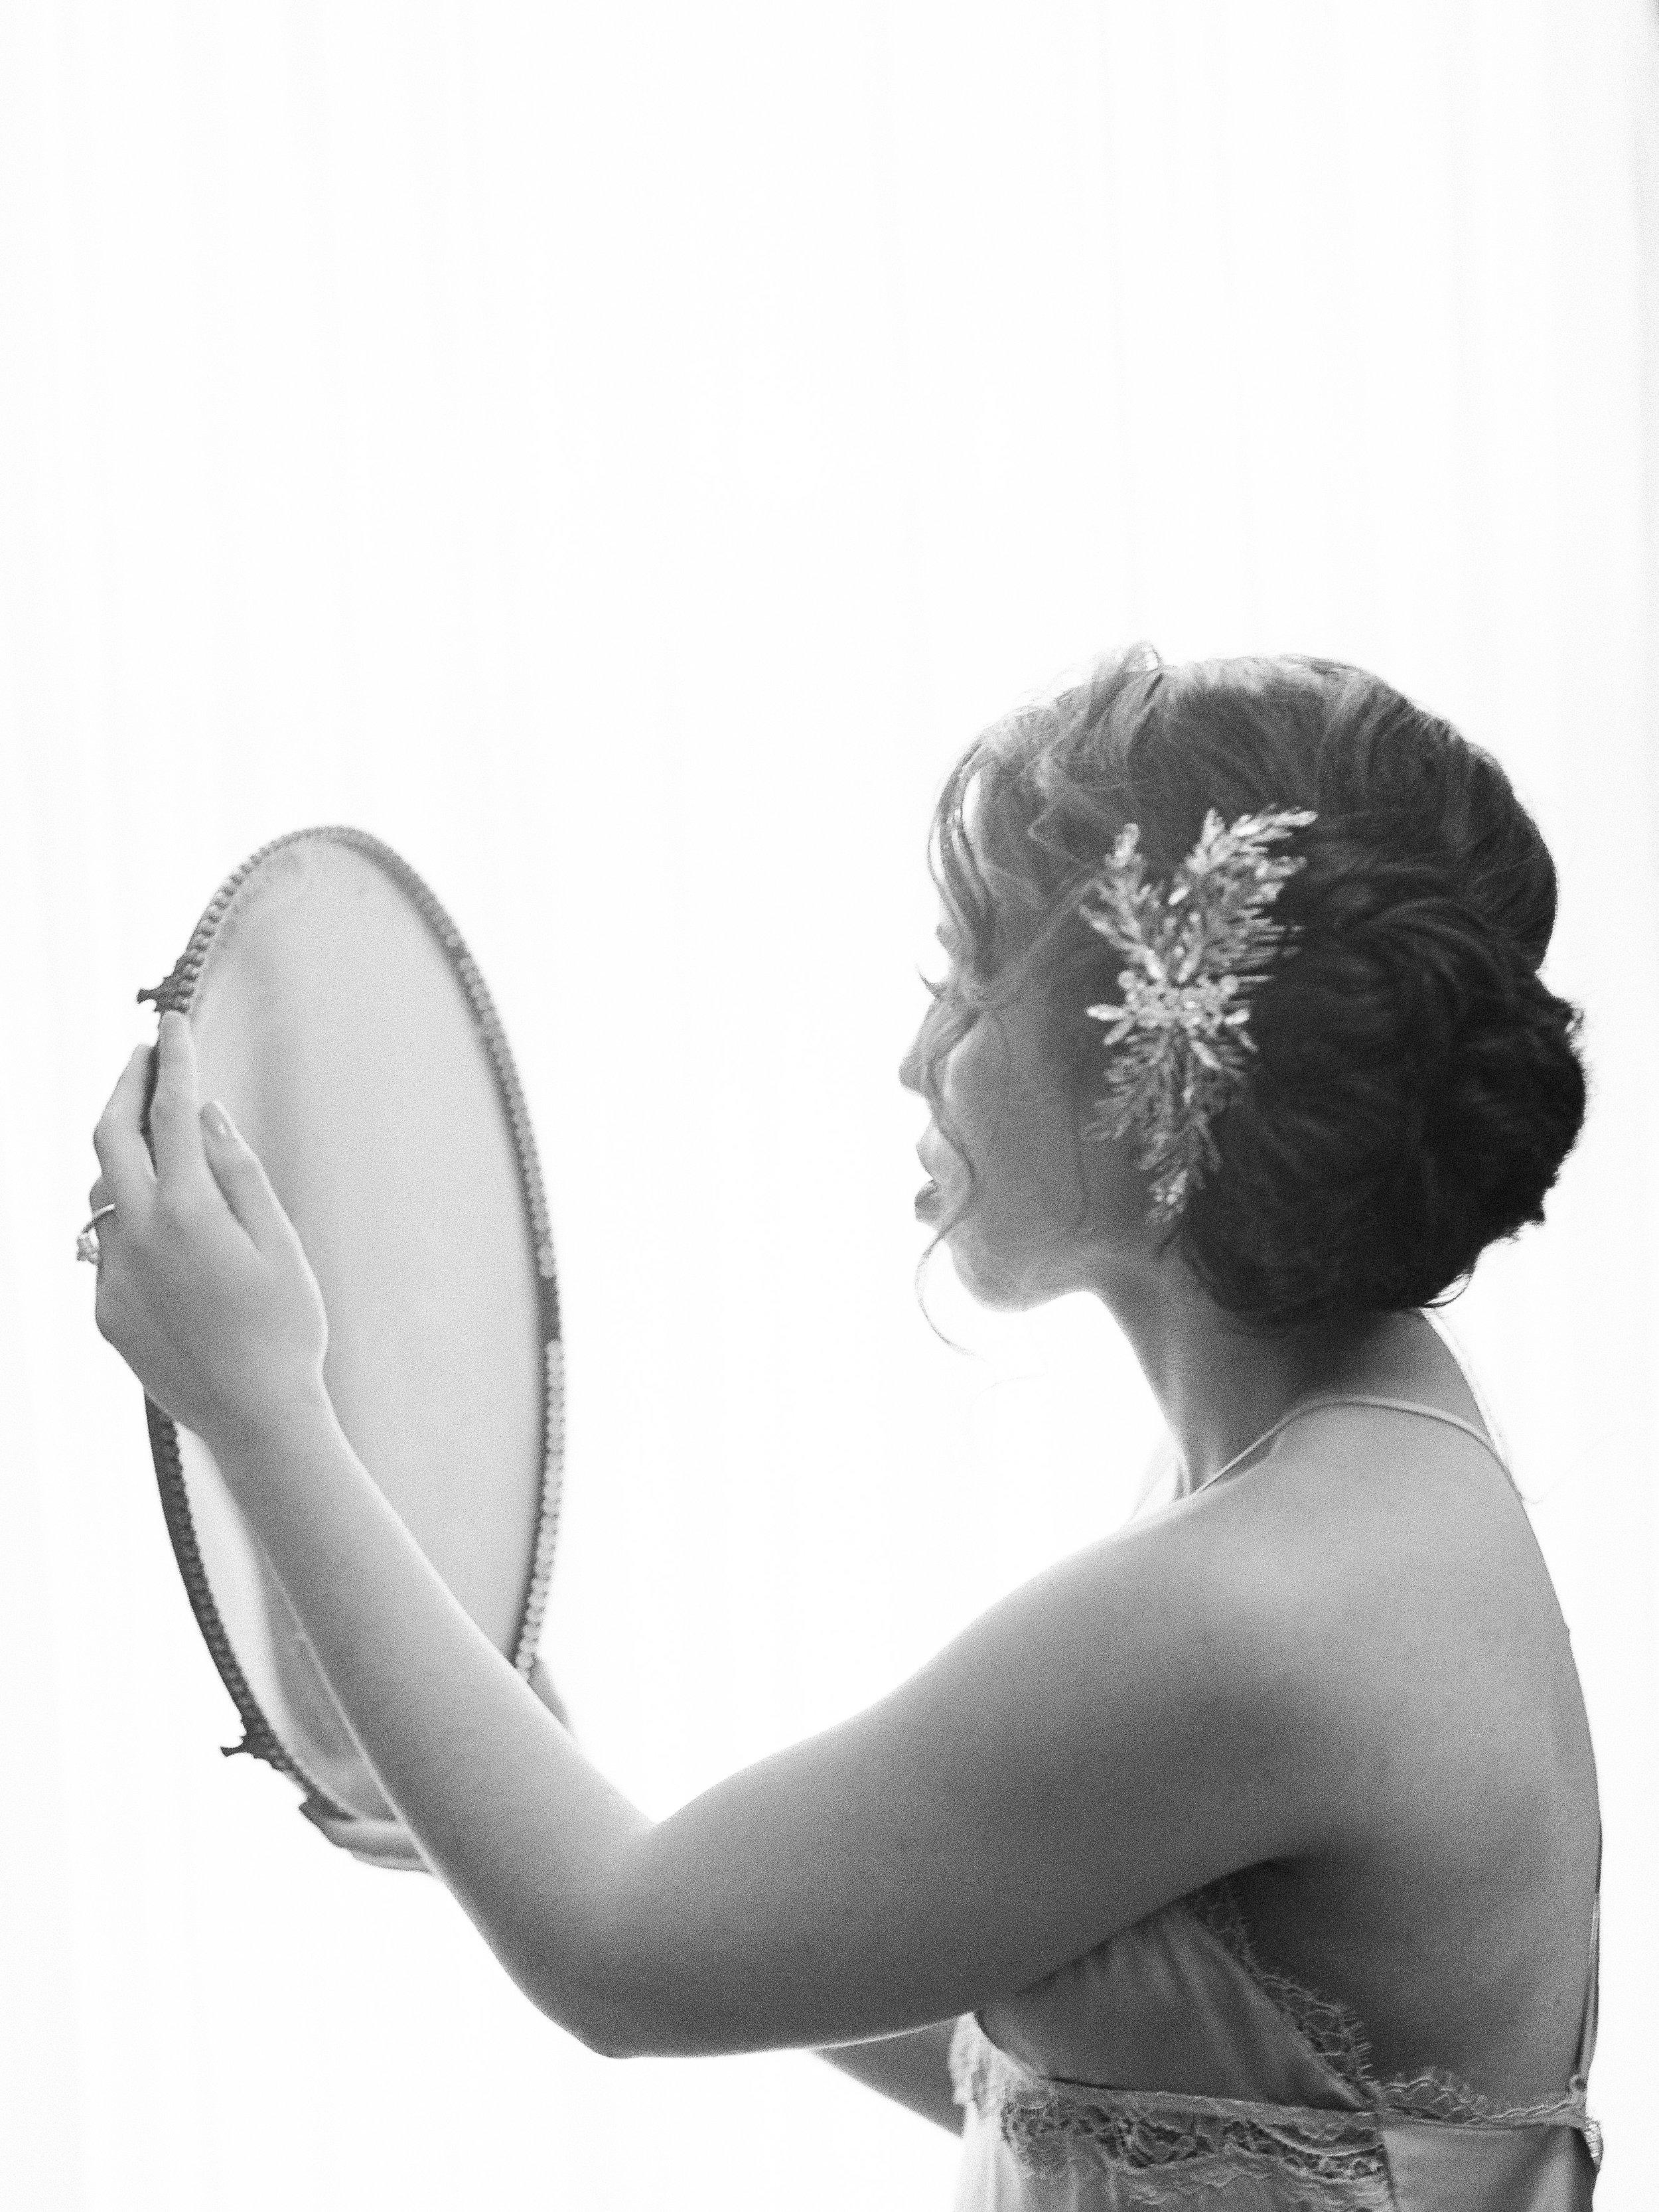 Ithaca New York-Brides Story-Manda Weaver-Wedding-54.jpg